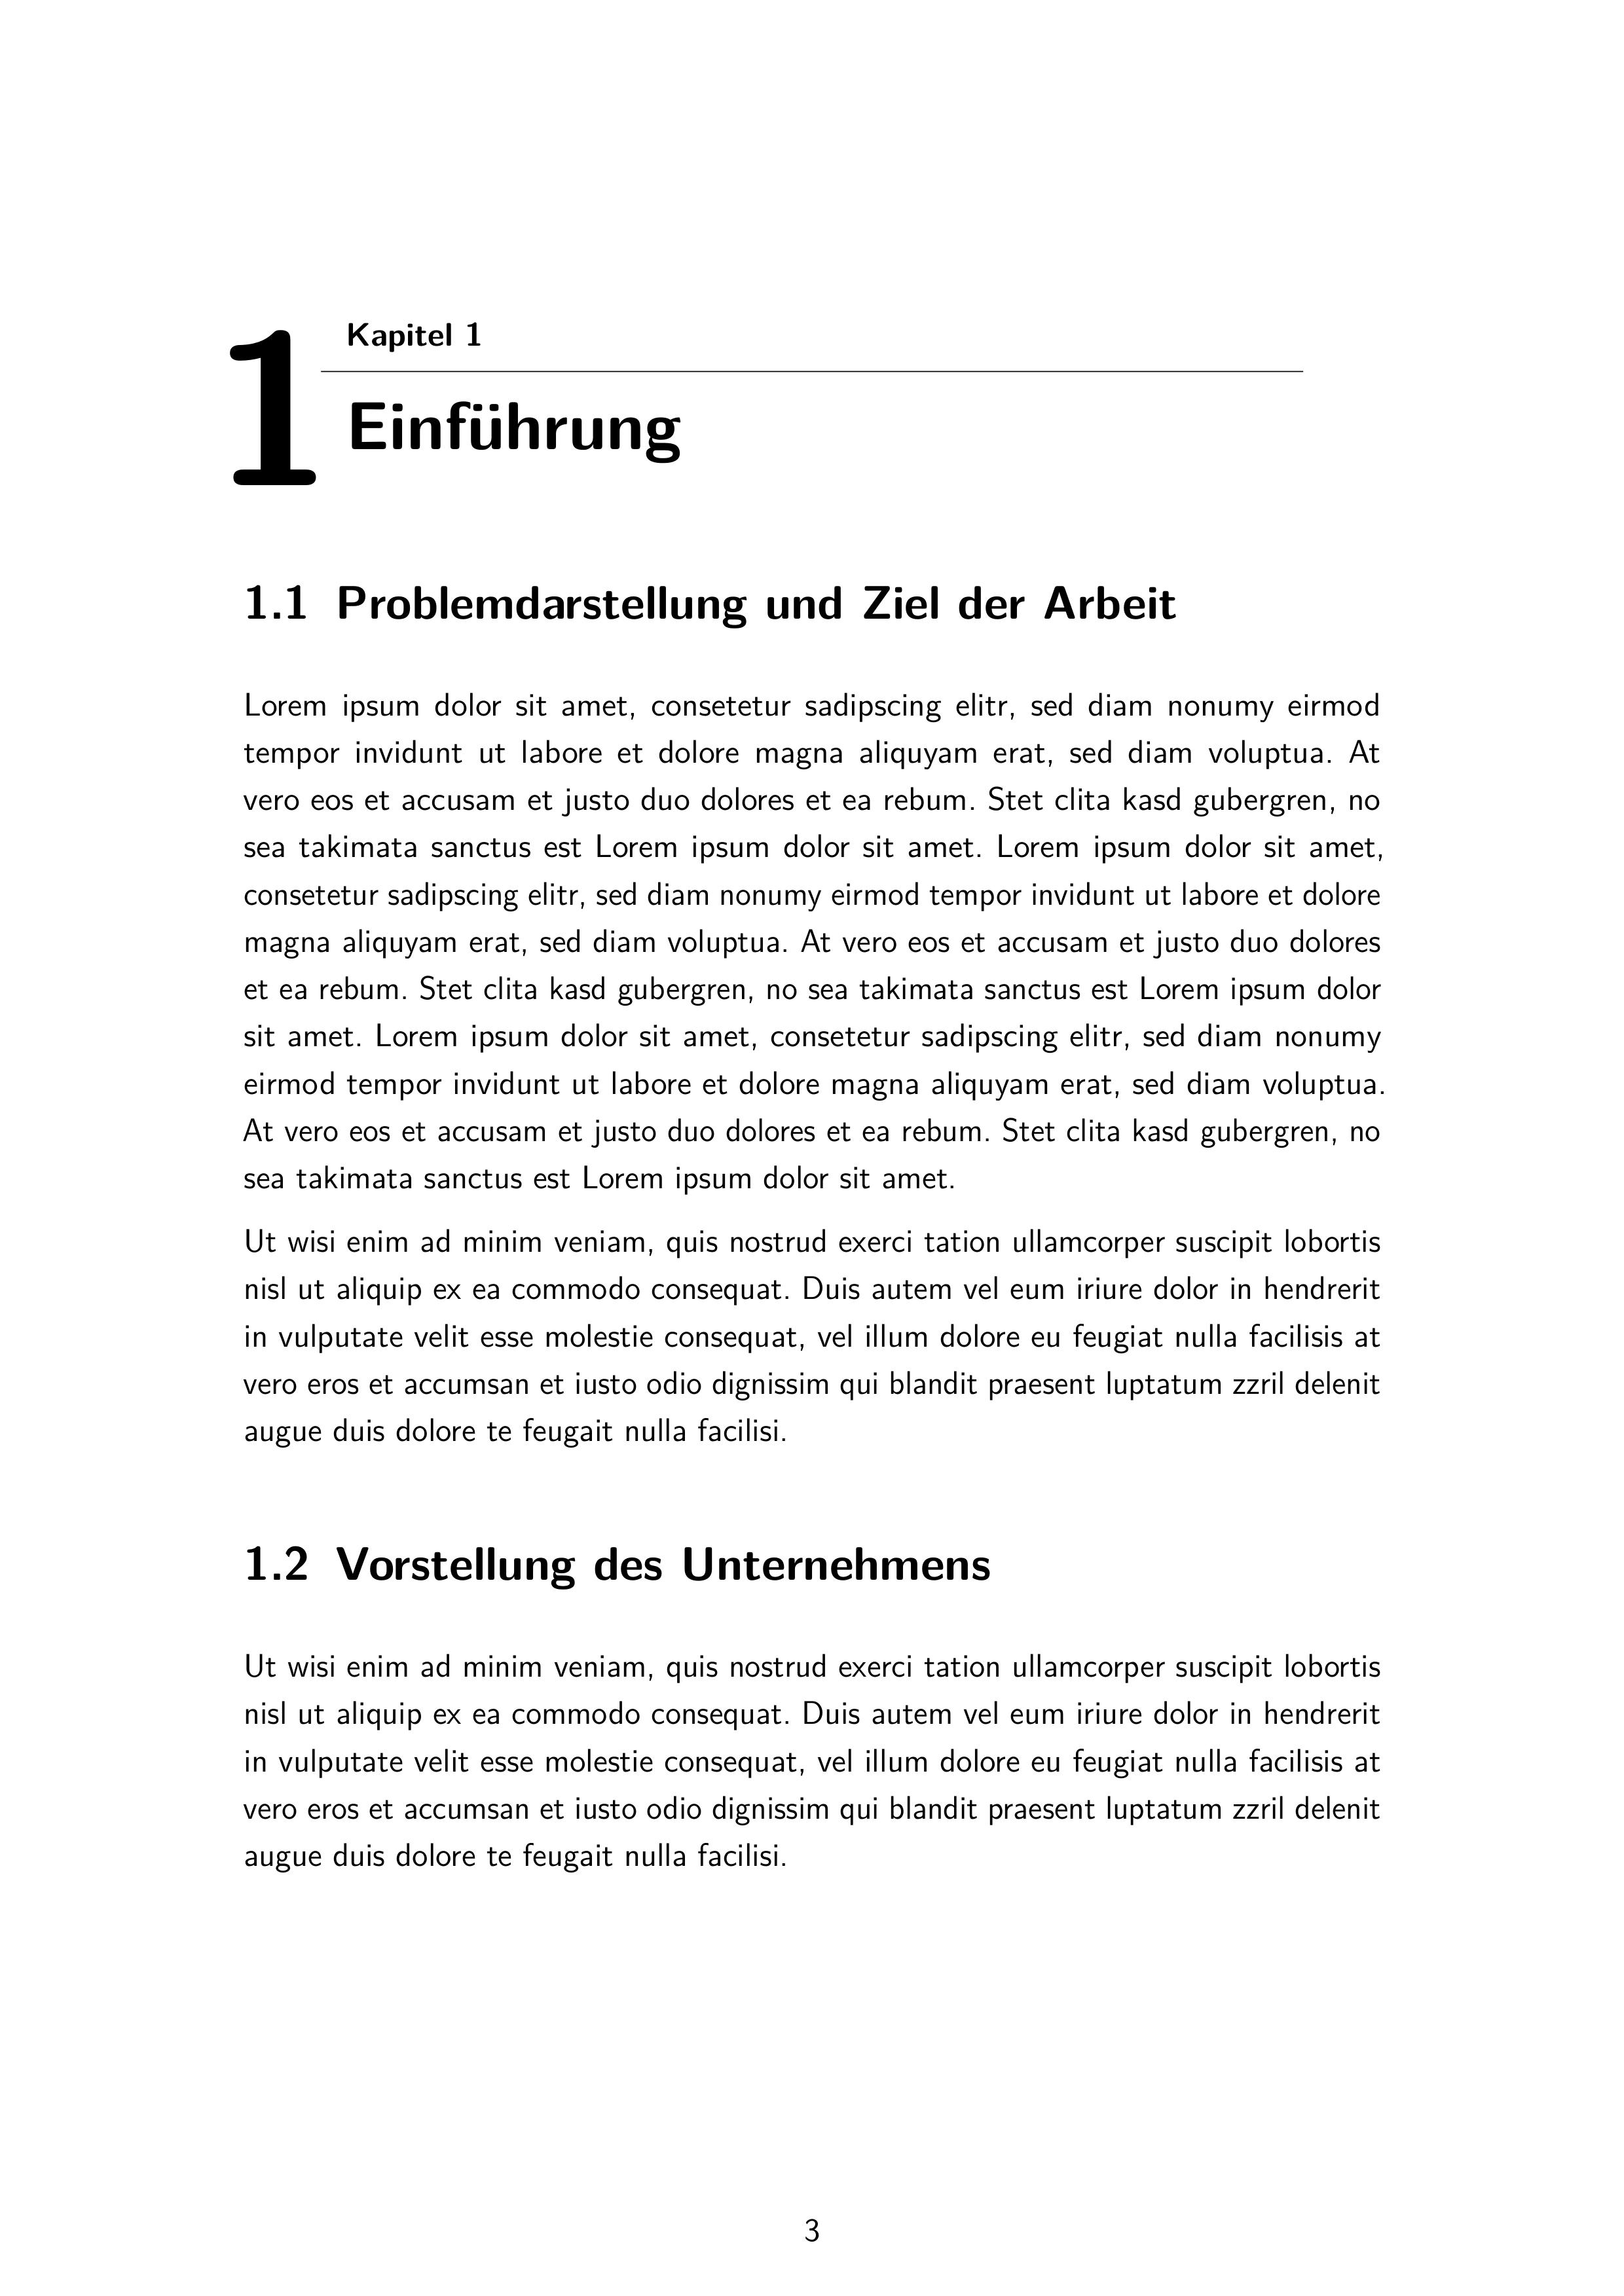 Fabian Alexander Kommoss Universitaet Potsdam Accademiaprofessionebianca Com